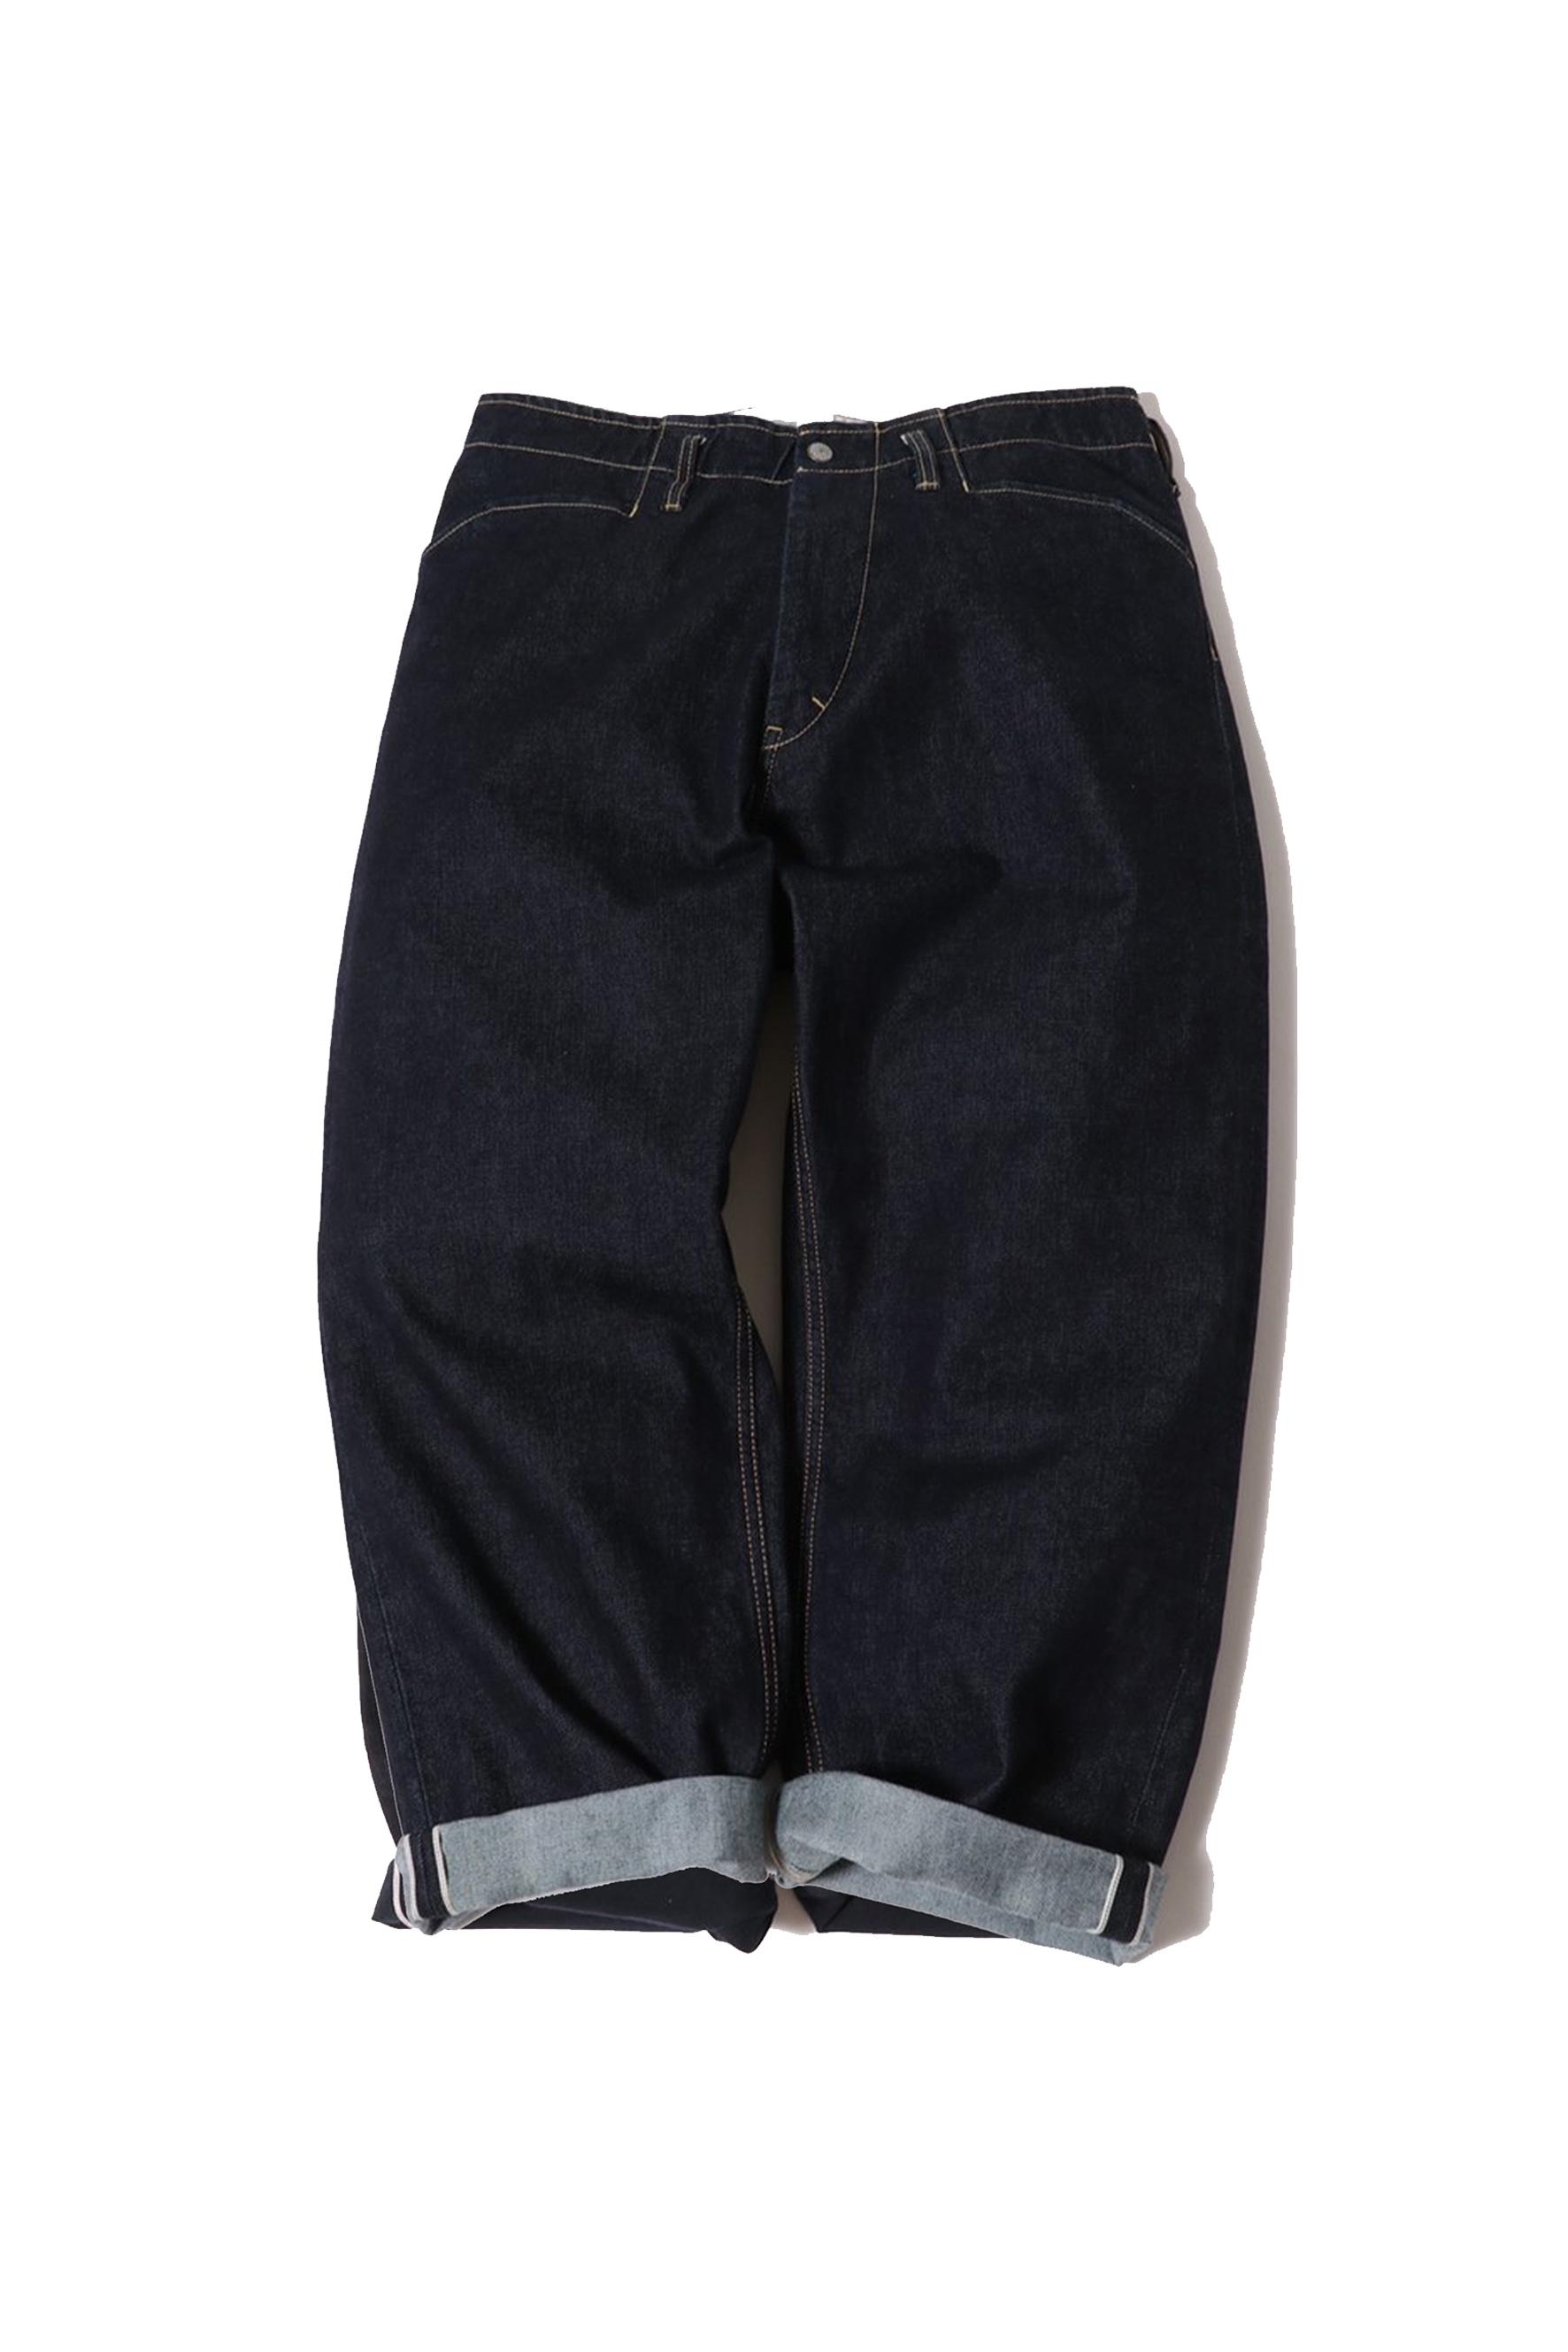 12.5oz Denim Frisco Pants / one wash